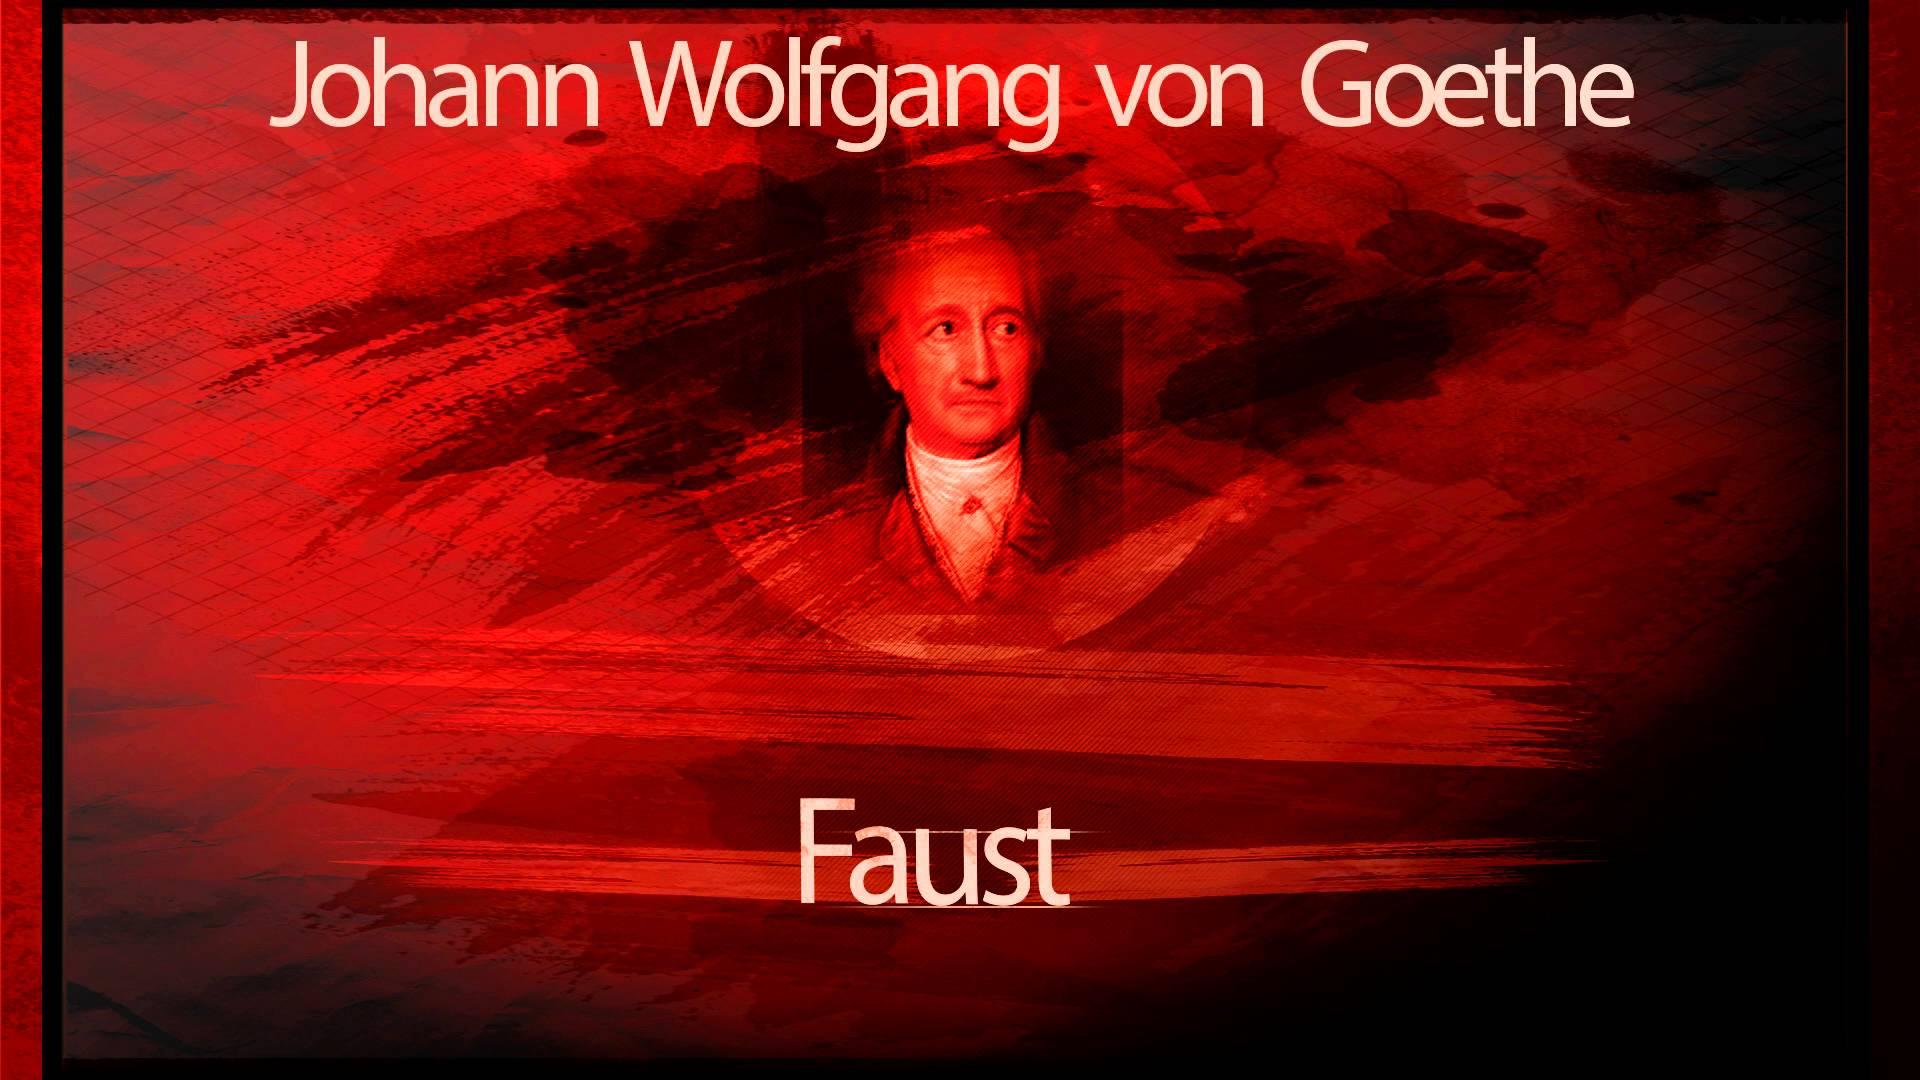 Goethes - Faust das komplette Werk - gratis Hörbuch